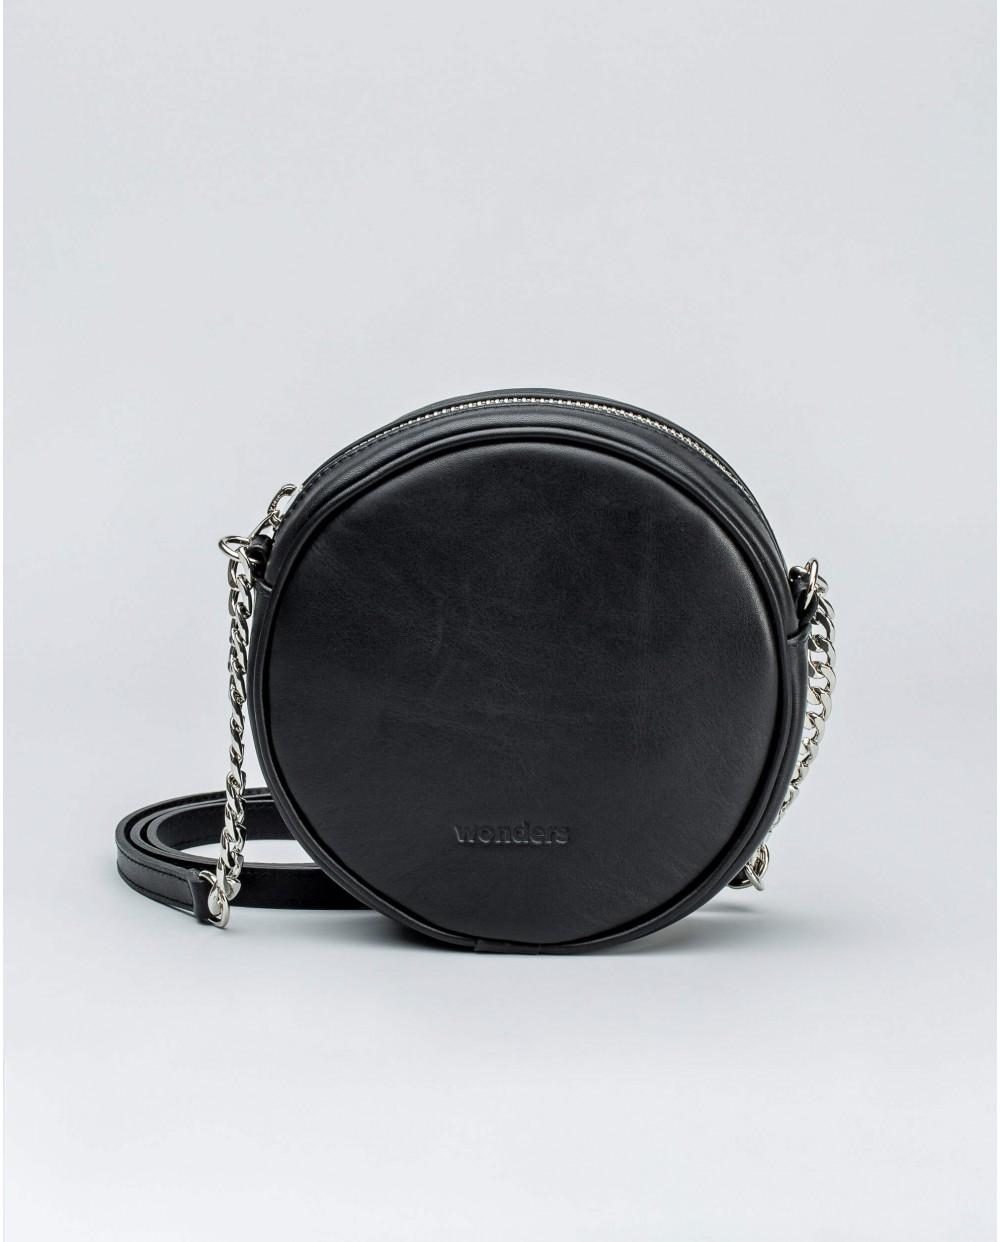 Wonders-Outlet-Crossbody circular handbag